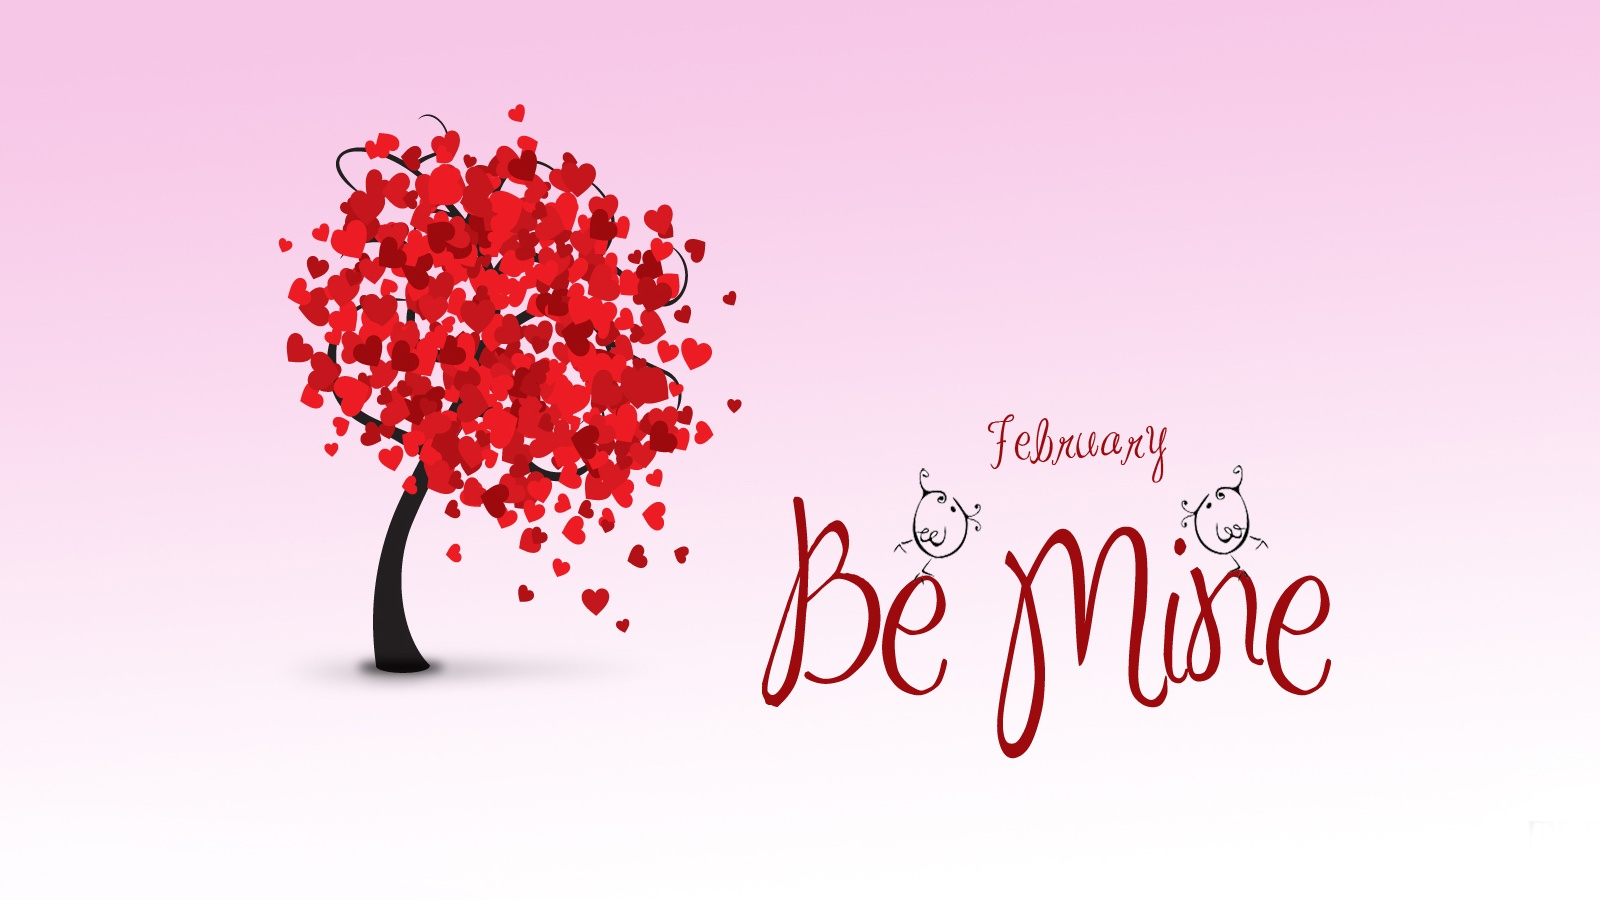 Valentines Day Wallpapers amp Desktop Backgrounds 1600x900